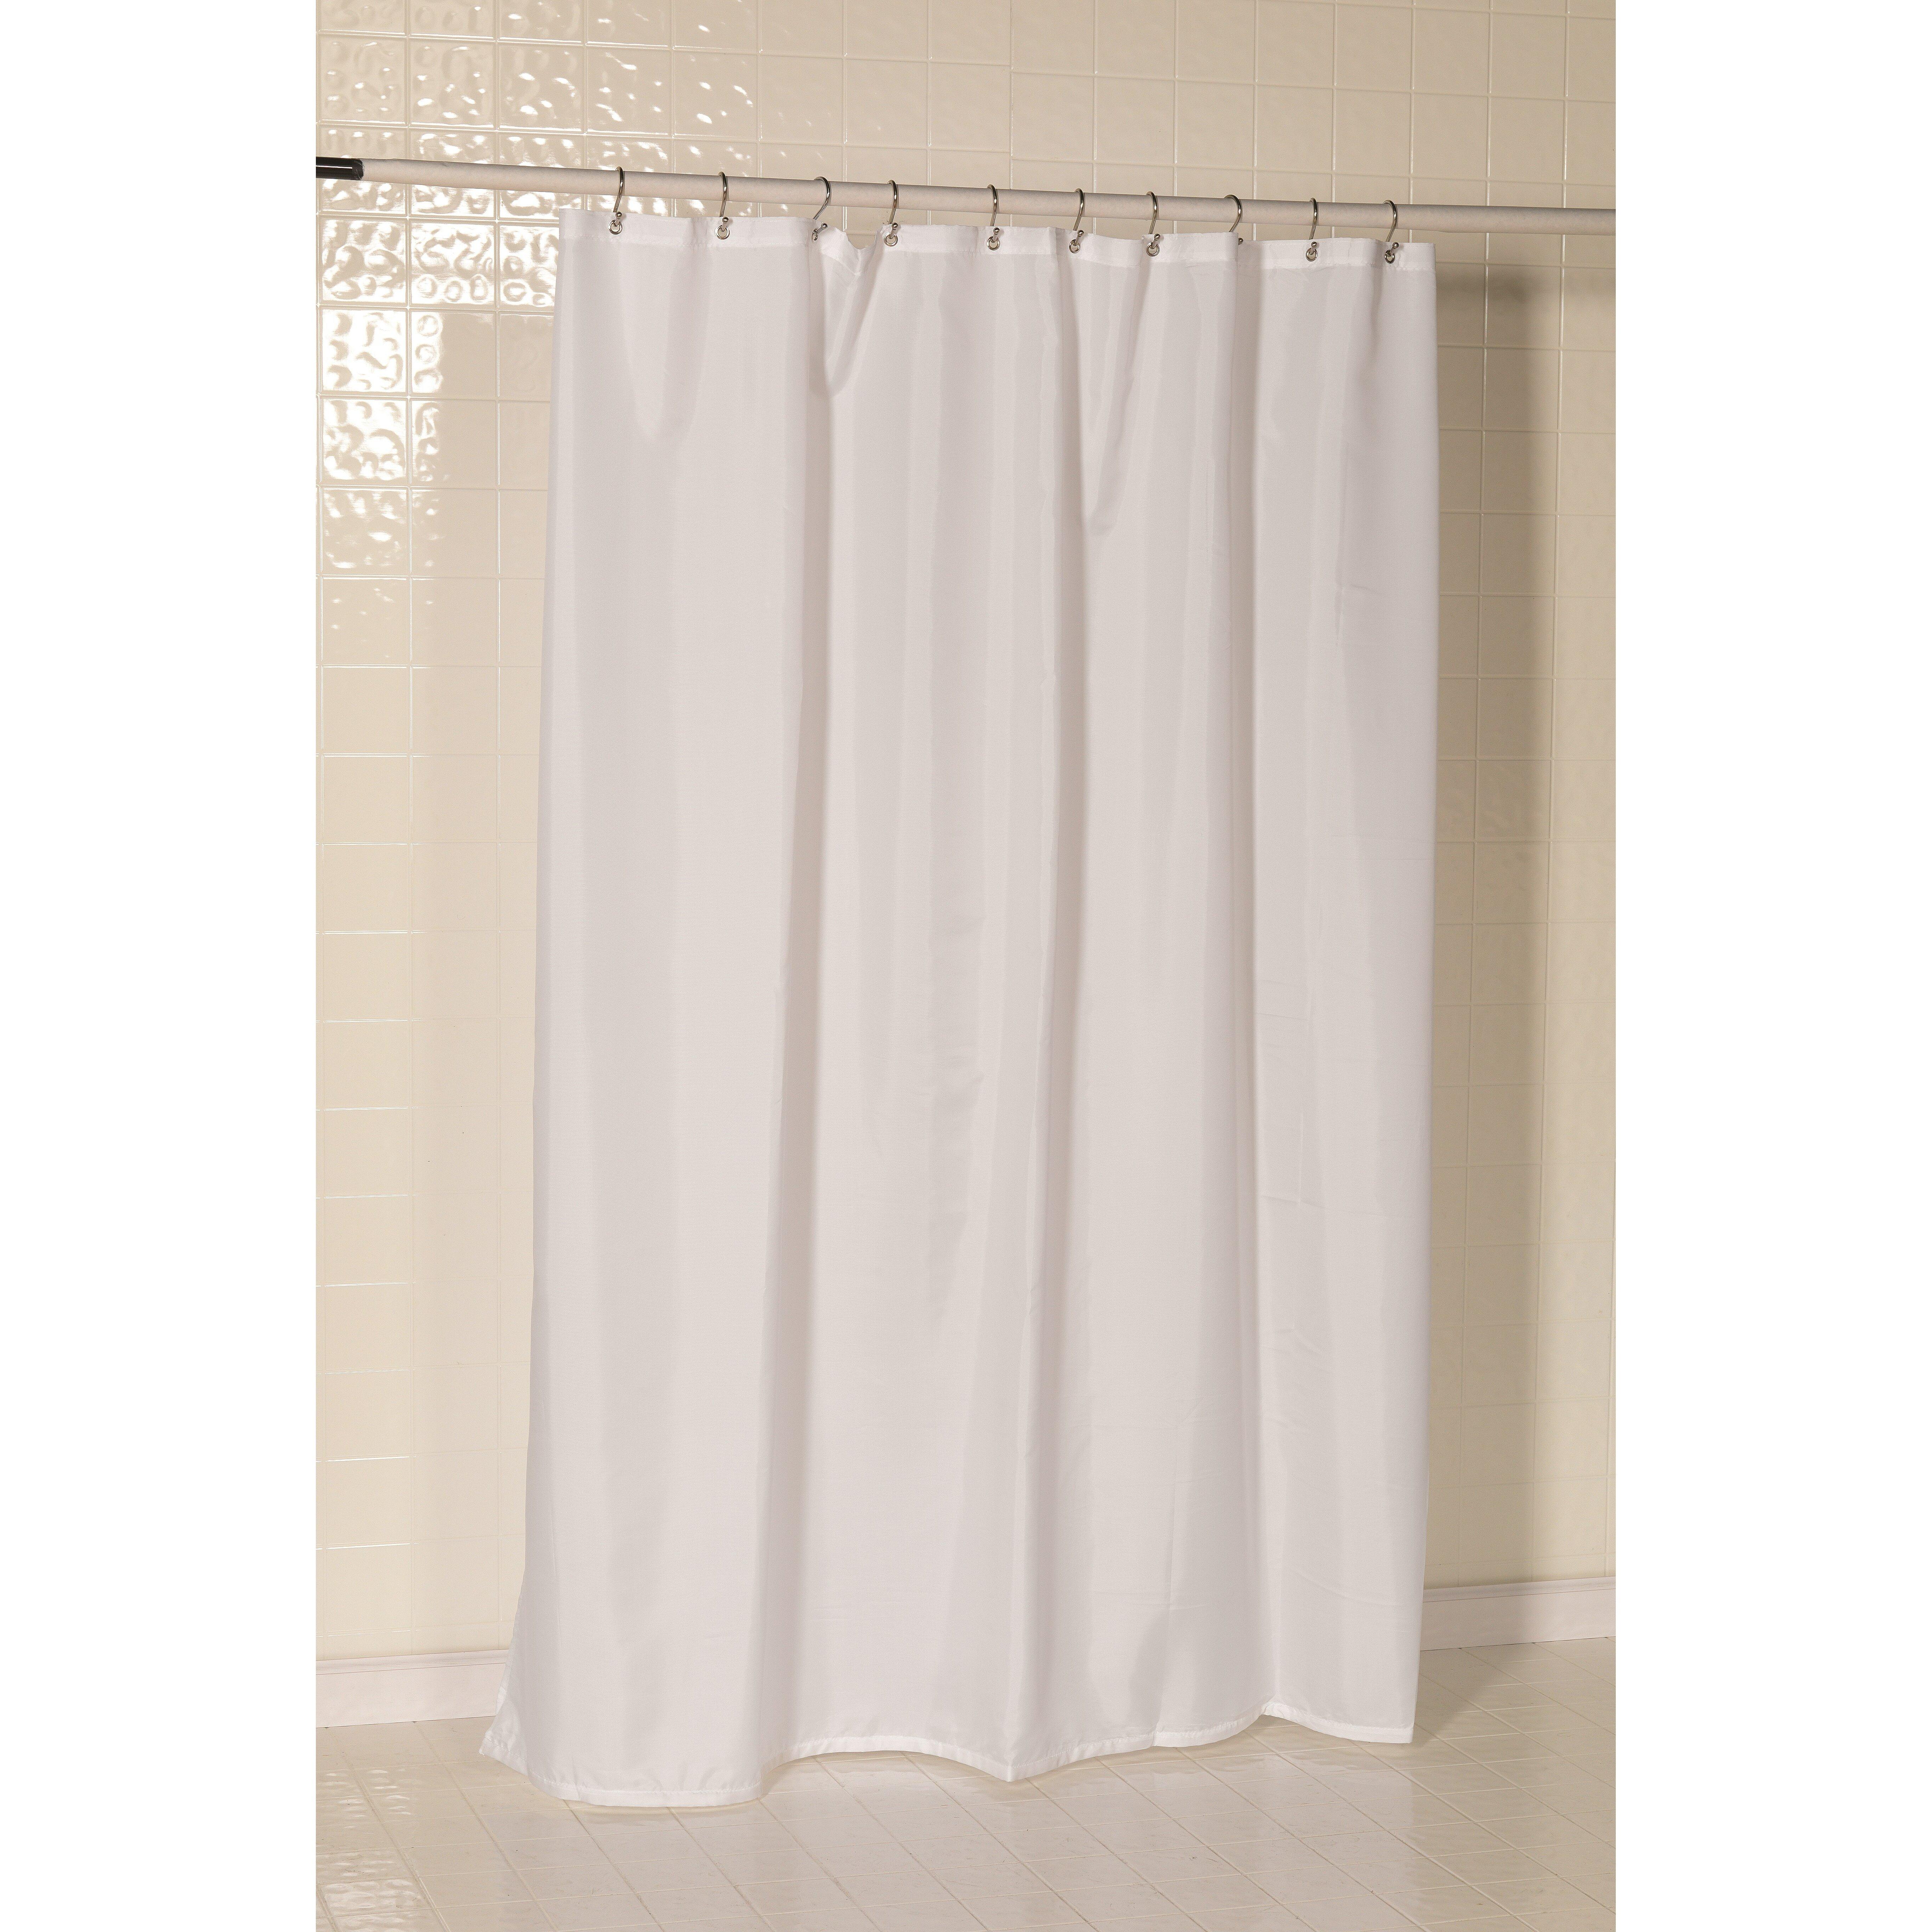 Charlton Home Tamesbury Nylon Shower Curtain Liner  Reviews Wayfair - Shower curtain